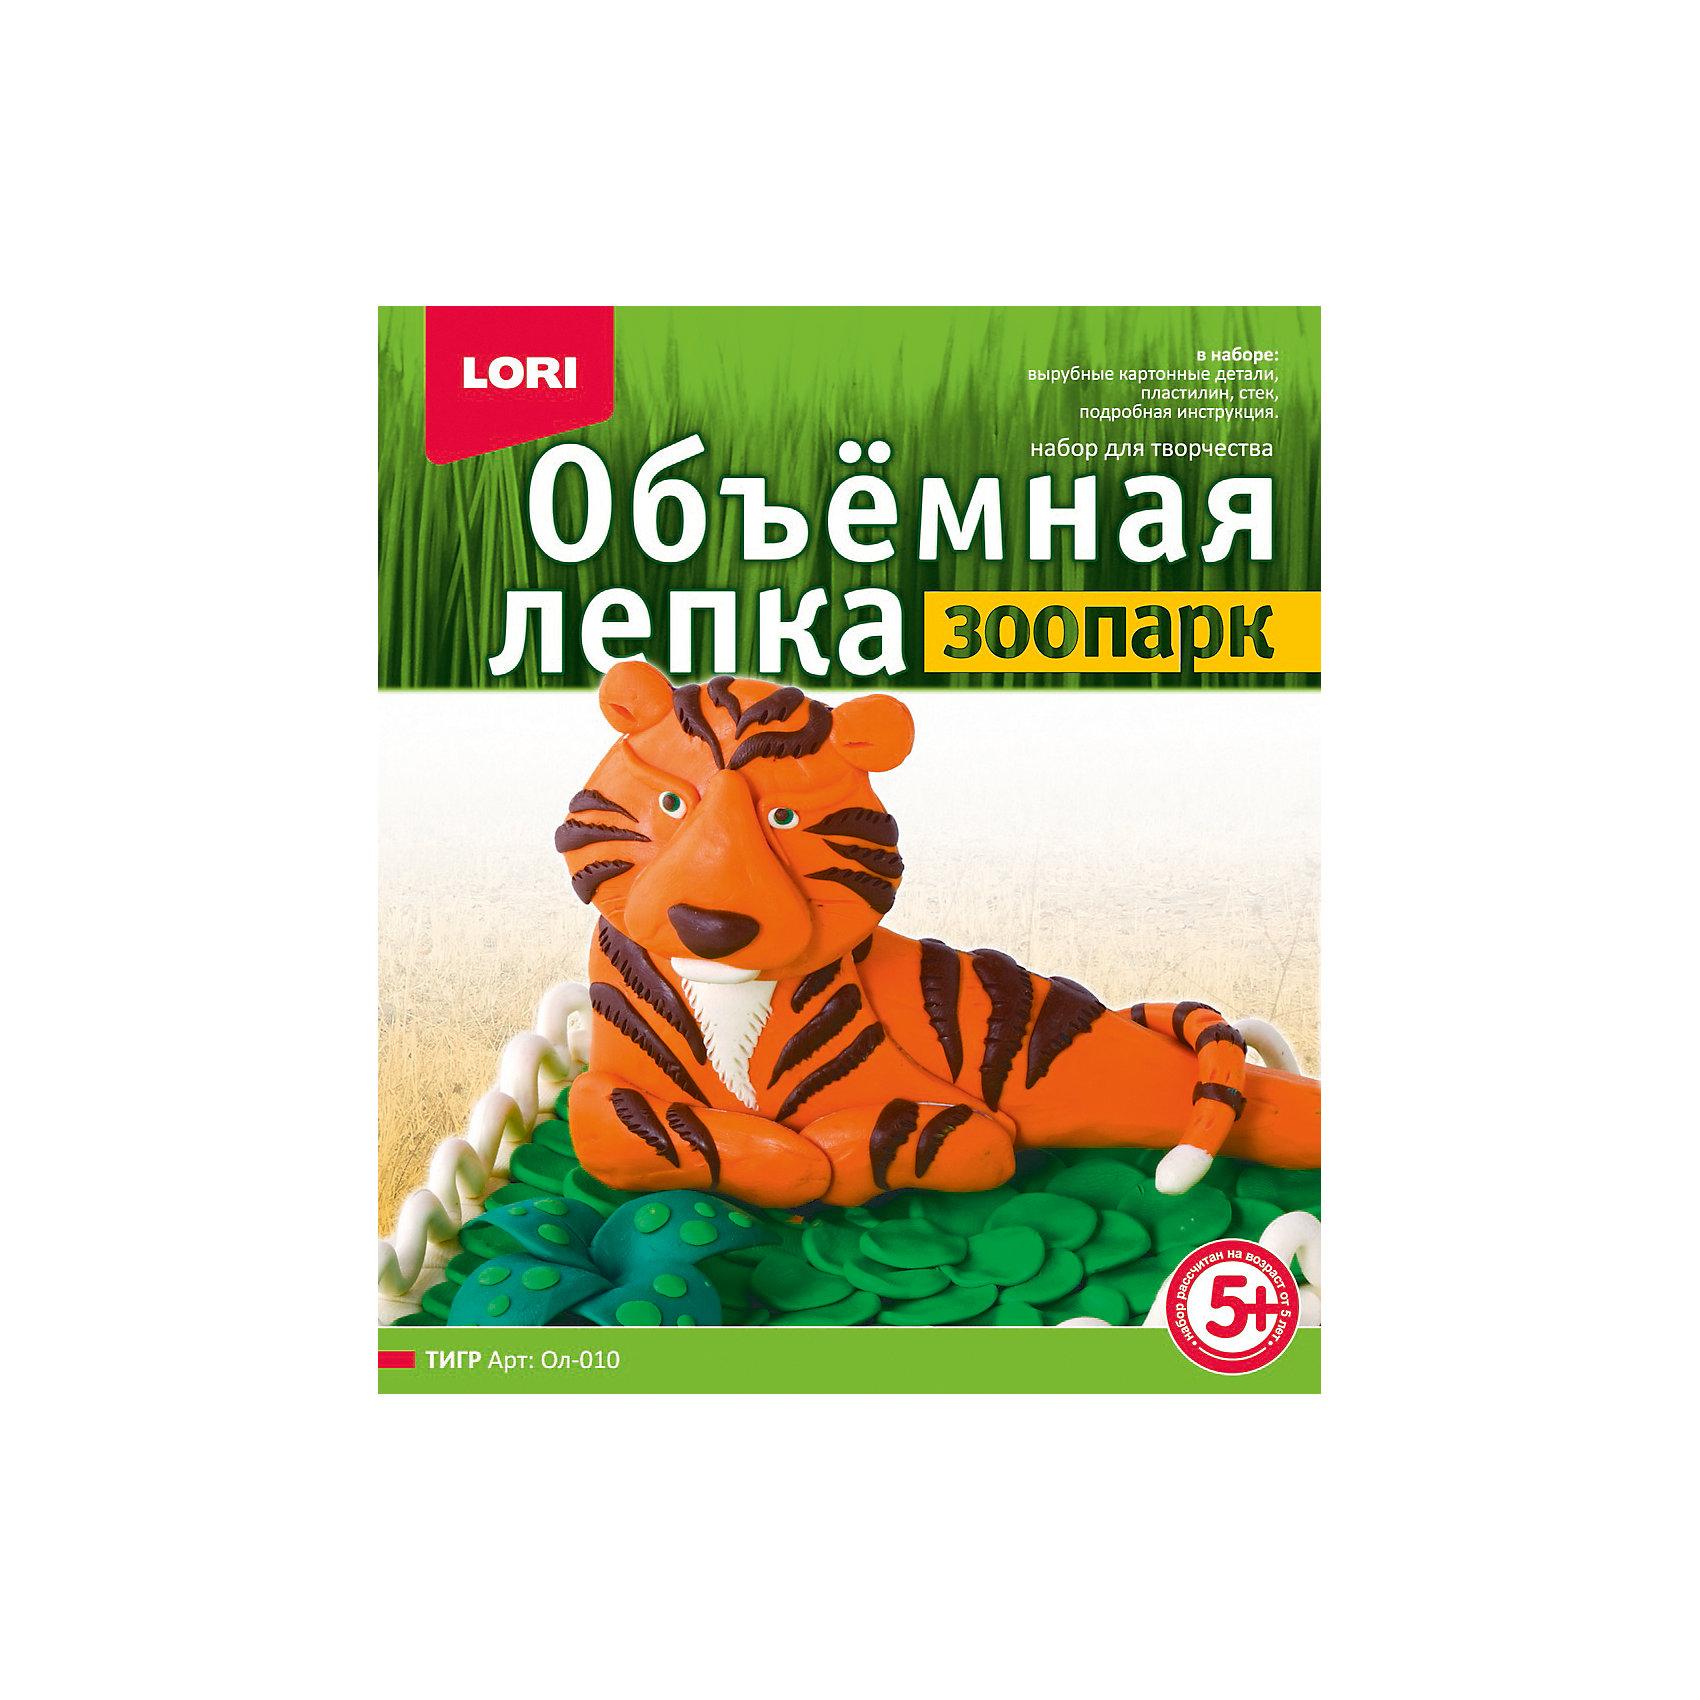 LORI Лепка объемная Тигр пластилин lori принцессы 12 цветов